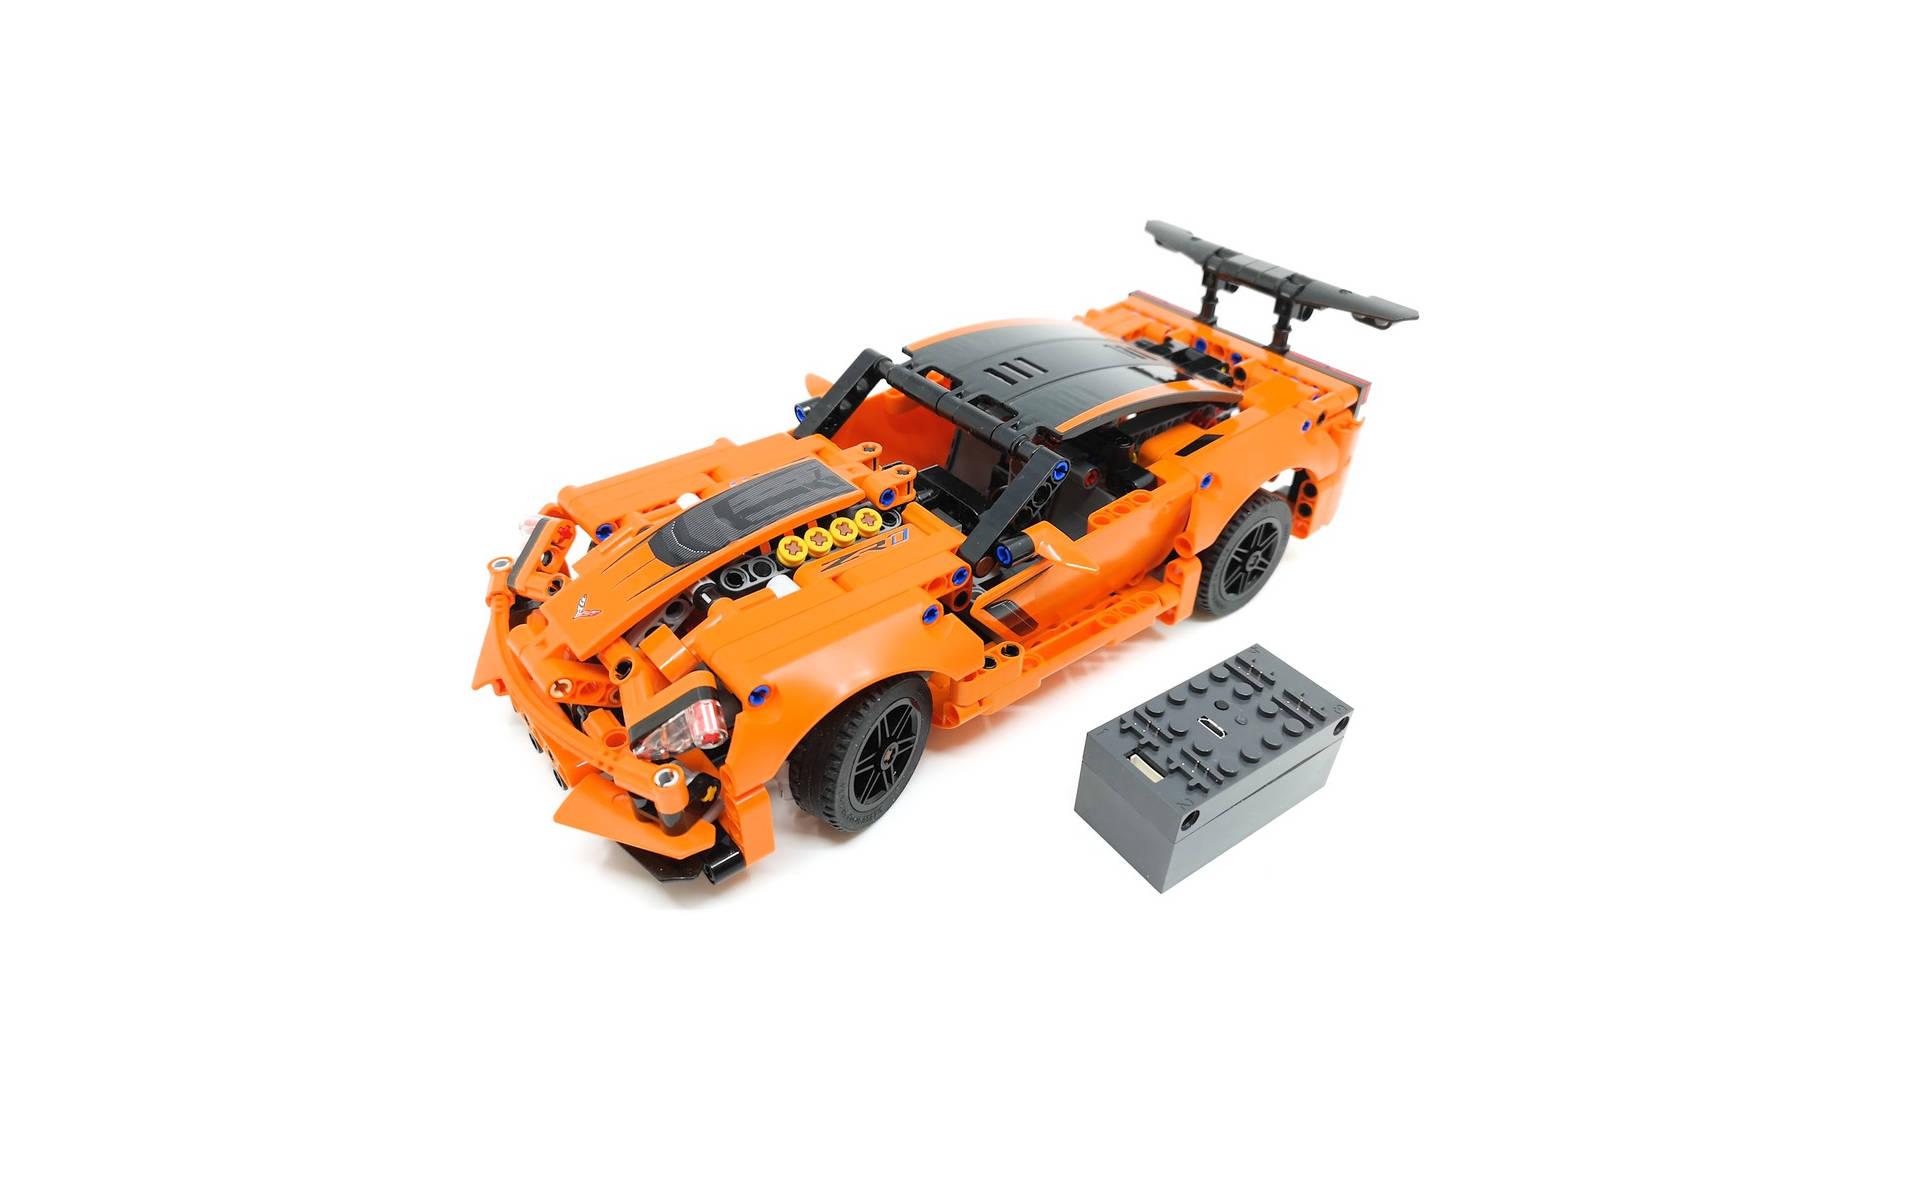 LEGO Technic Motorizzabili